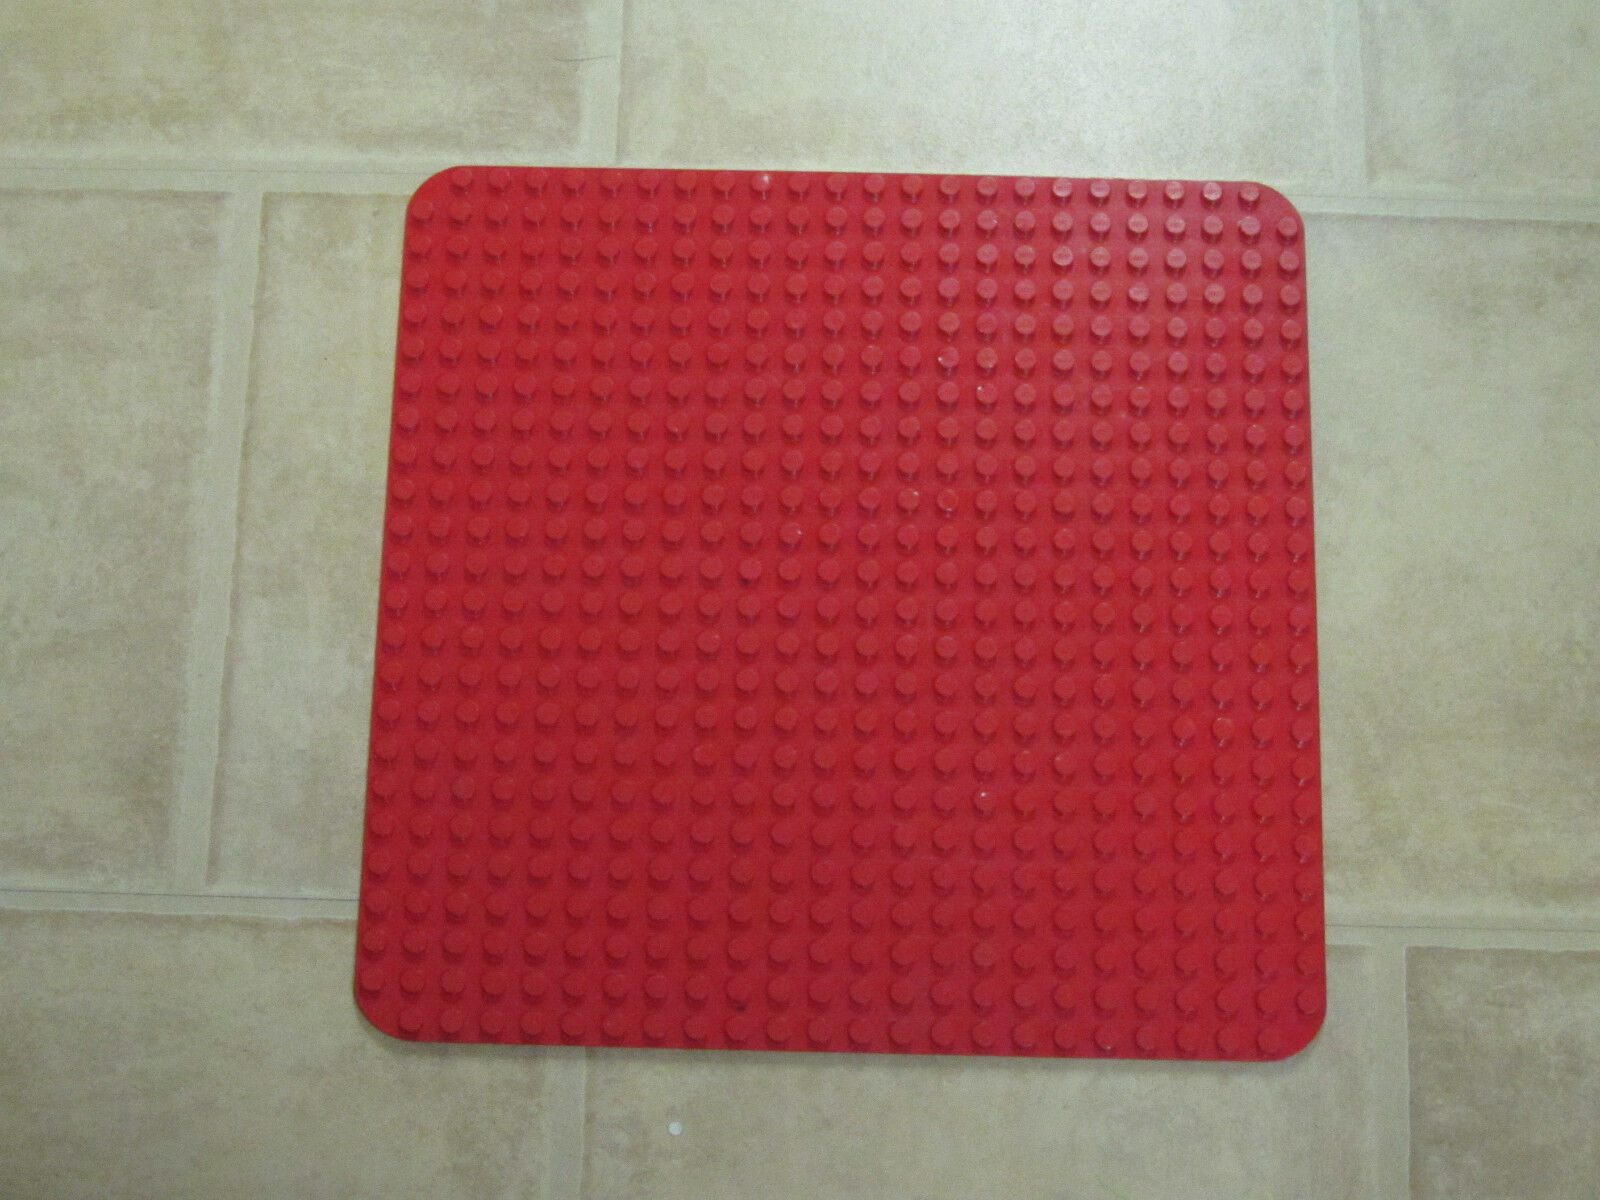 LEGO DUPLO Große Grundplatte Grundplatte Grundplatte Bauplatte Platte 38 x 38 cm Rot 4f33f6